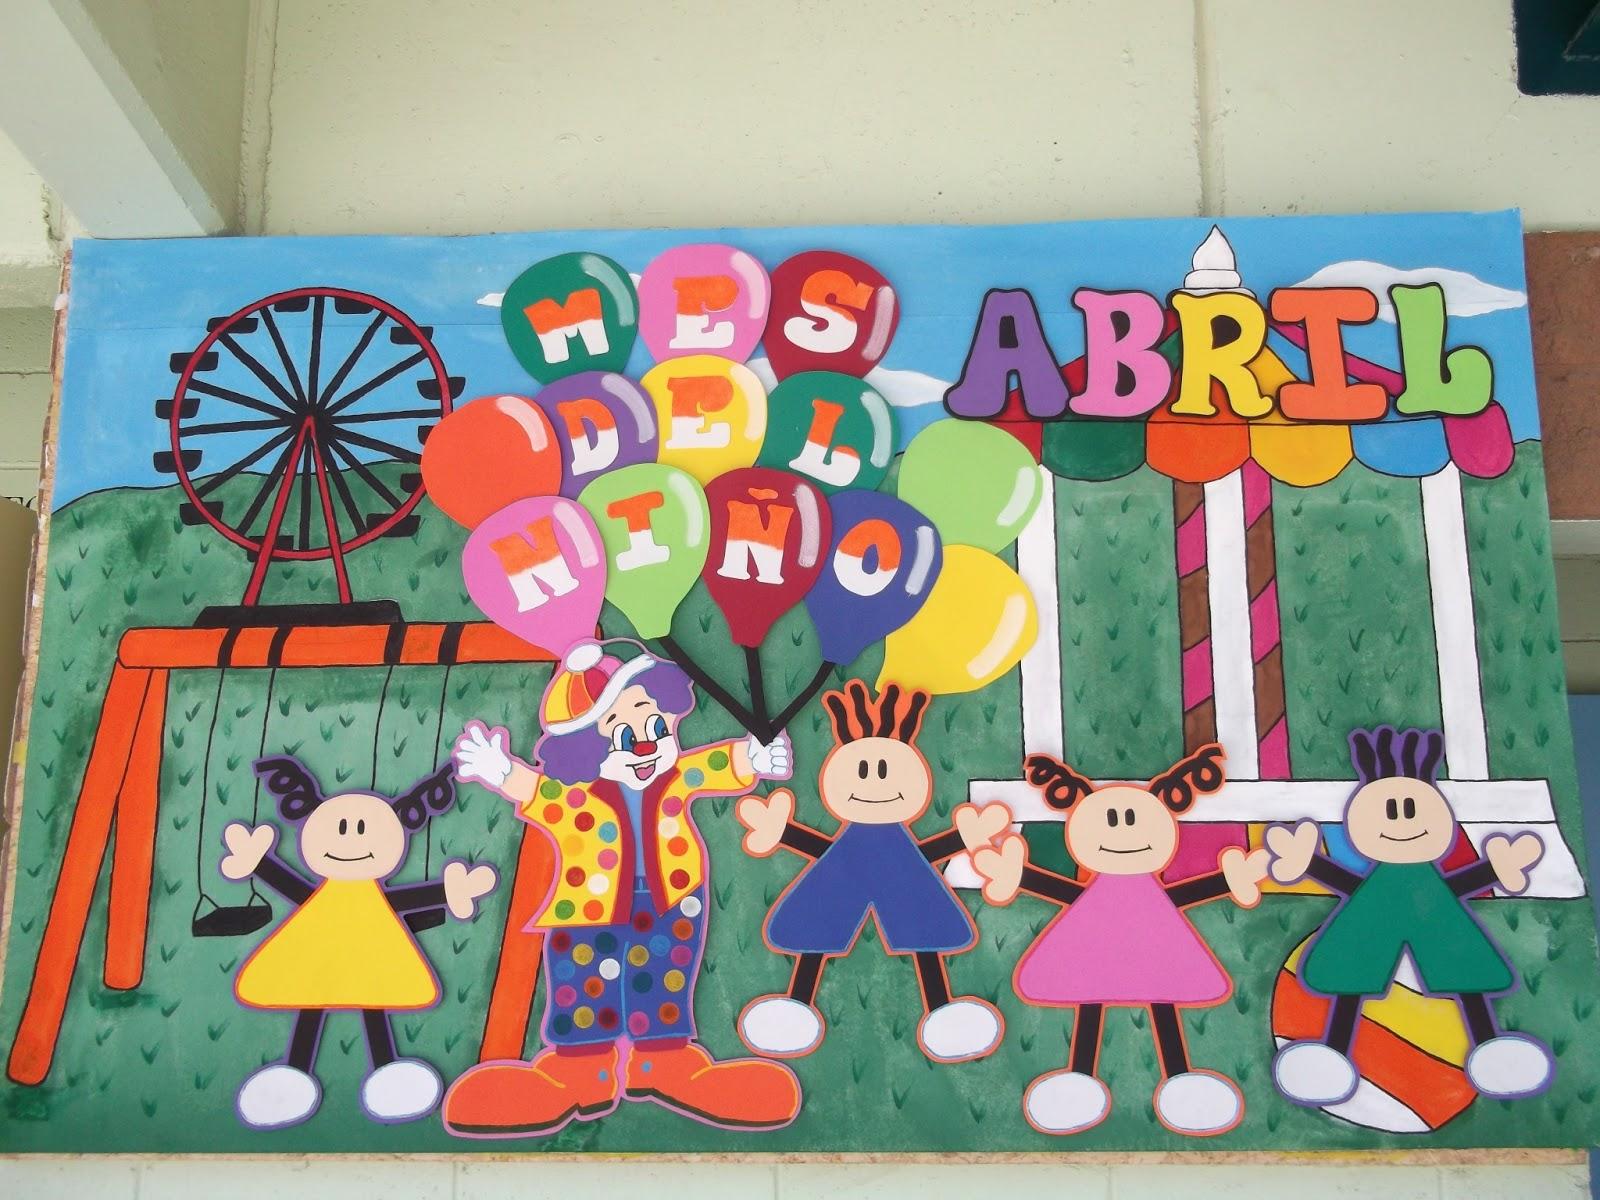 Decoraciones infantiles the teacher octubre 2013 for Decoraciones infantiles